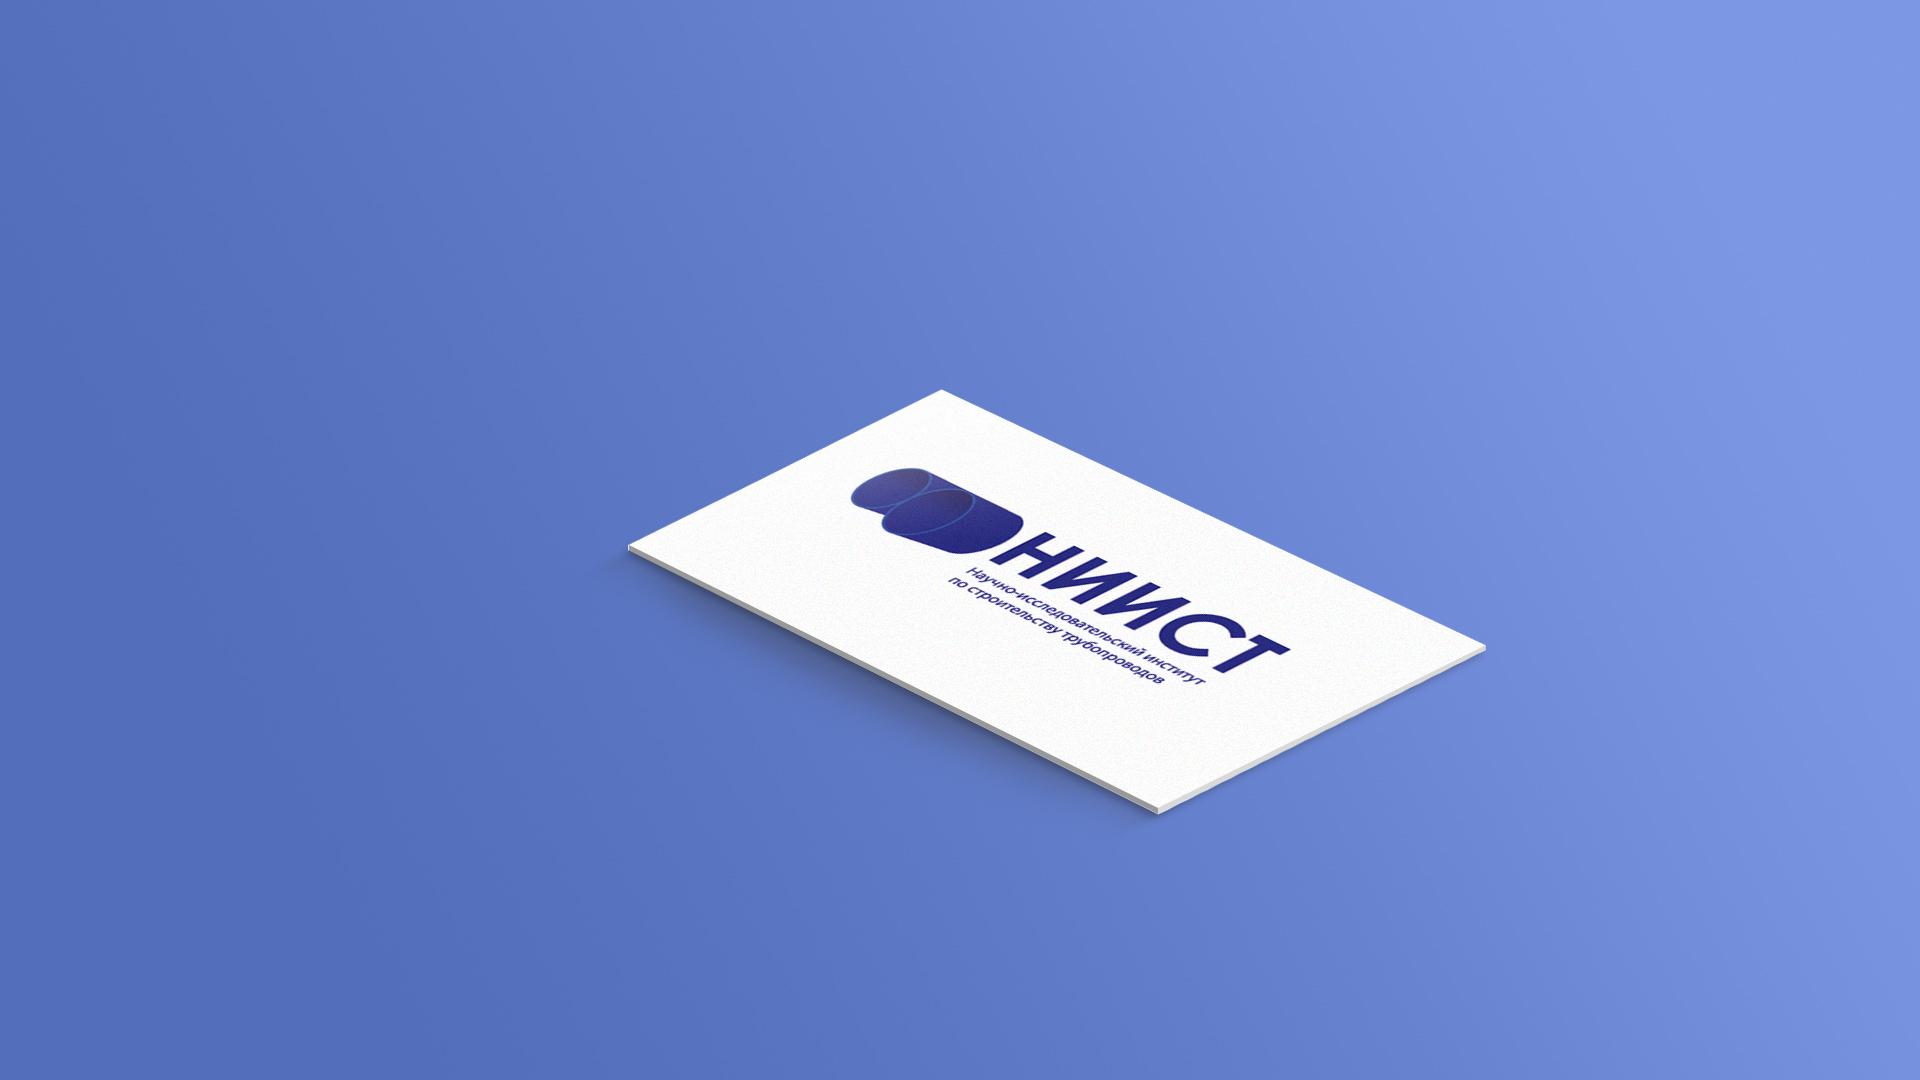 Разработка логотипа фото f_6365b9e8f8de7a1e.jpg